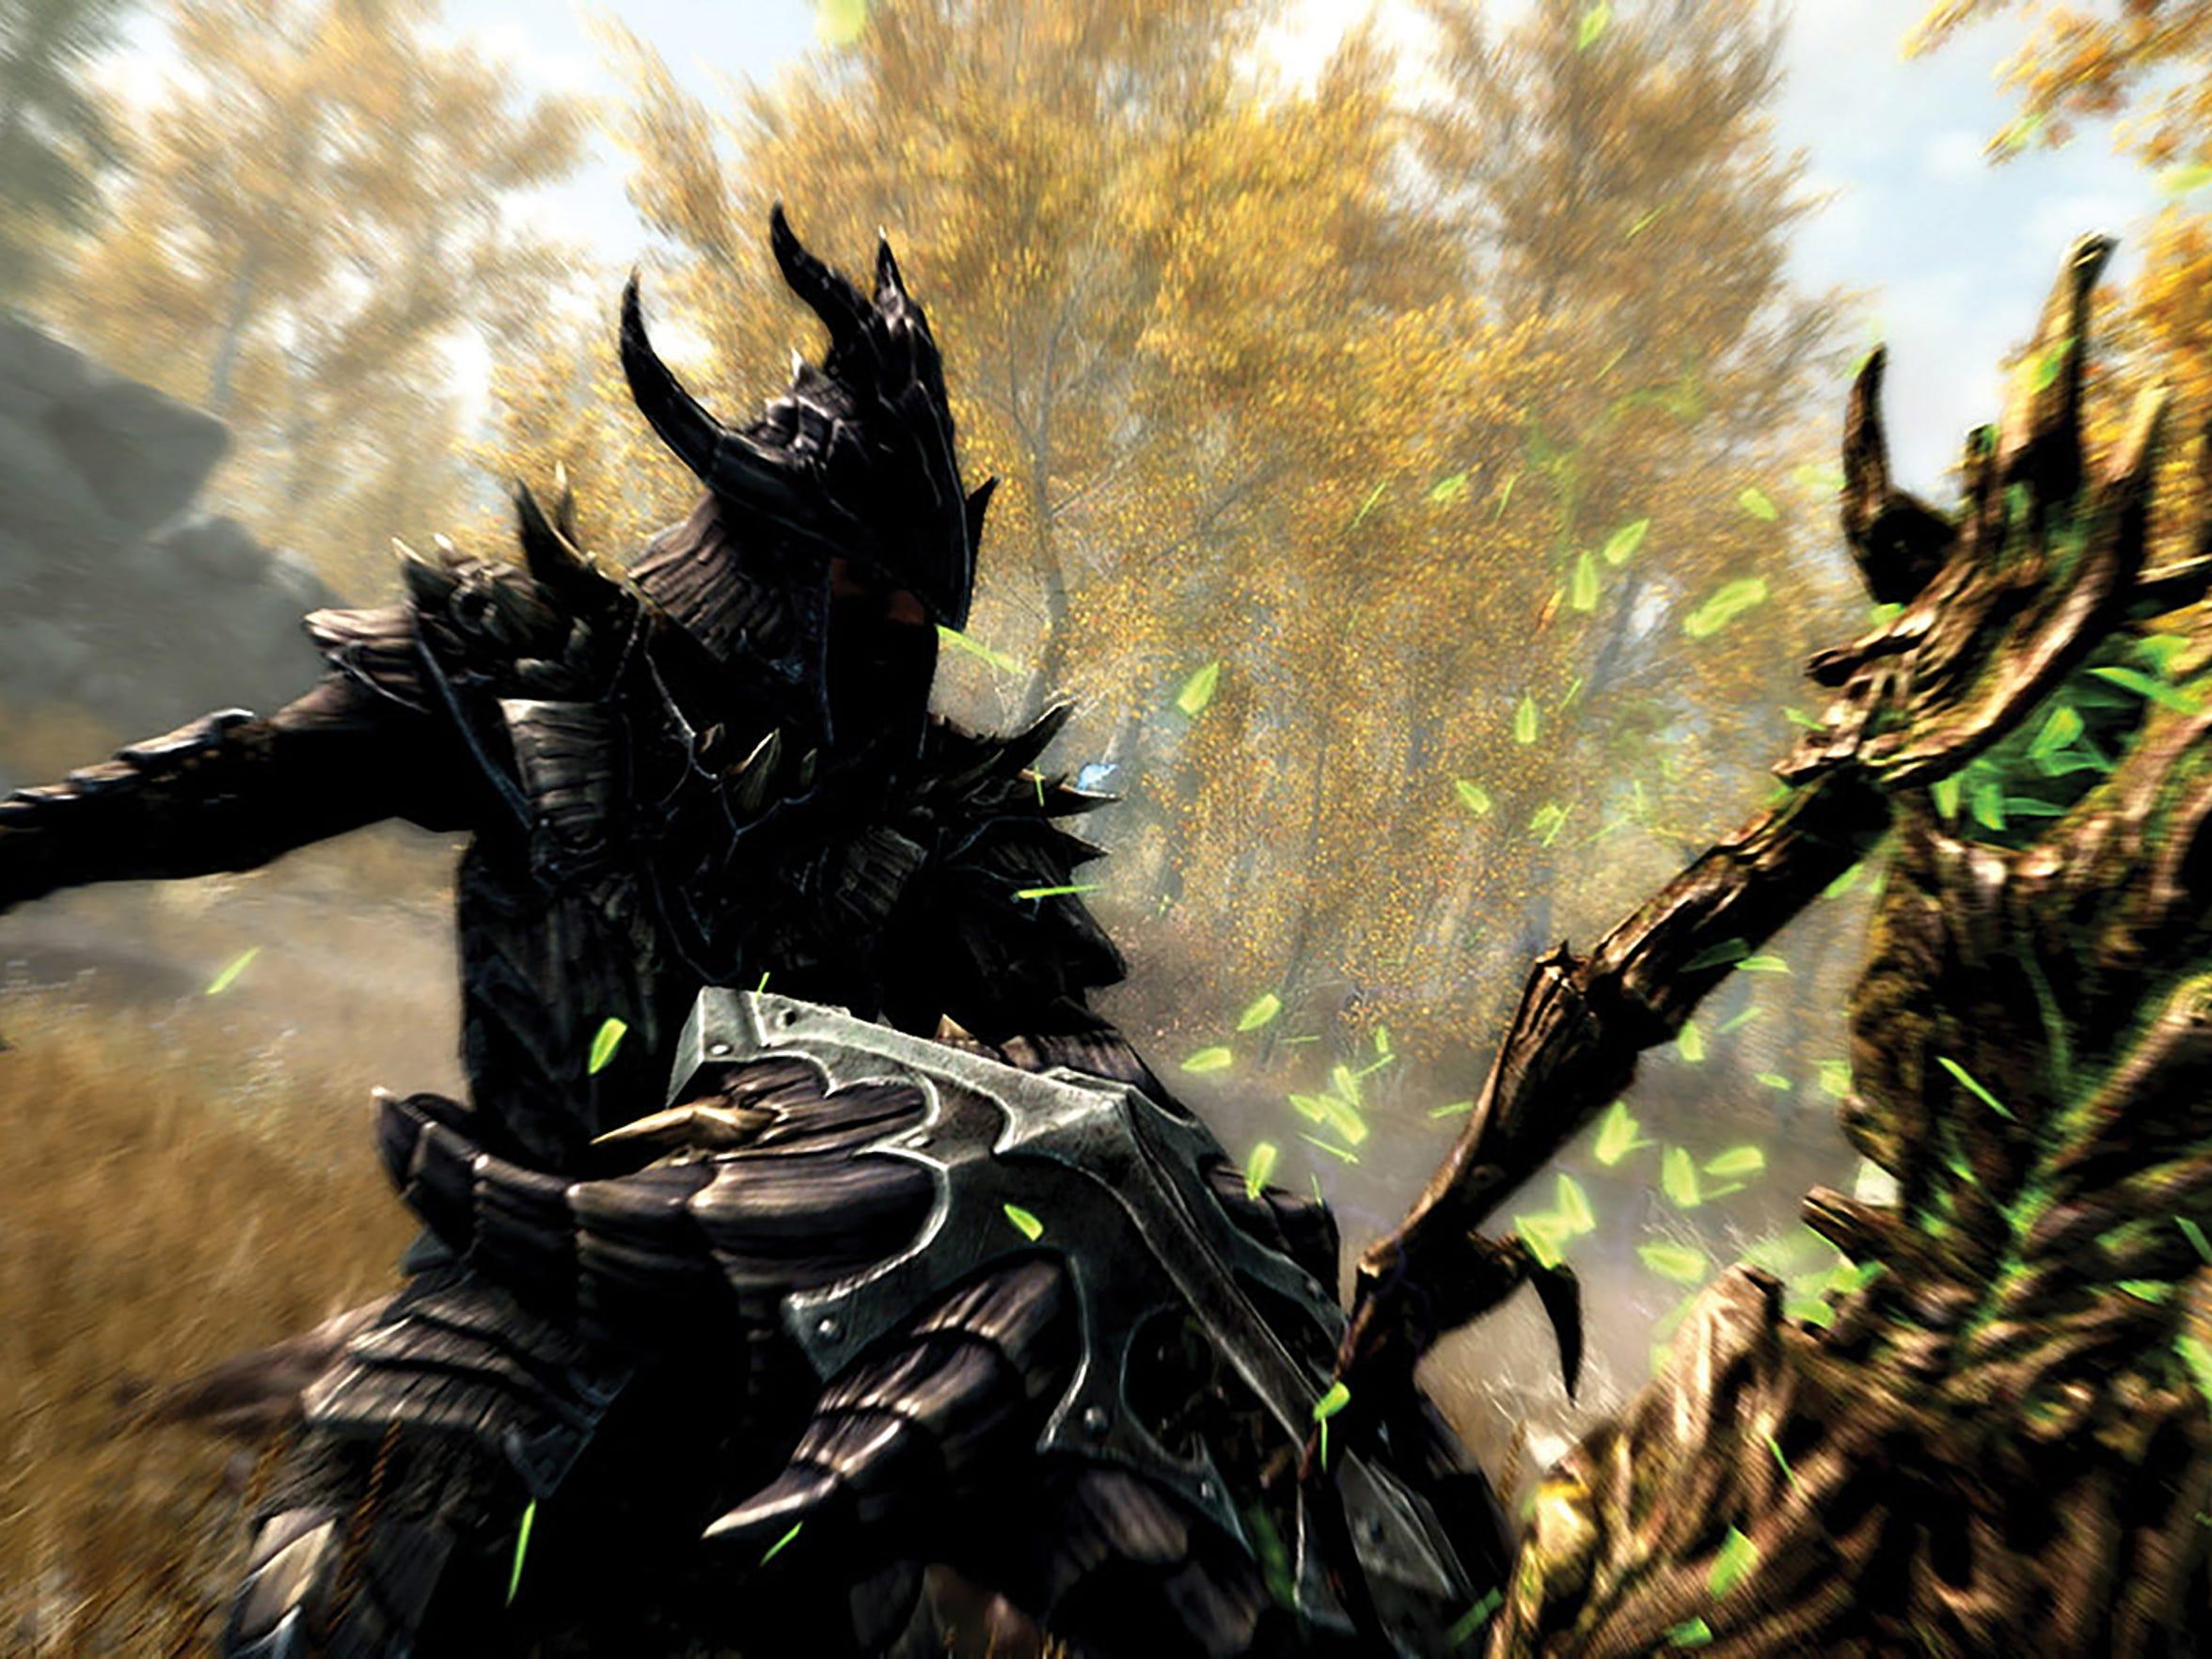 The Elder Scrolls V: Skyrim Special Edition.